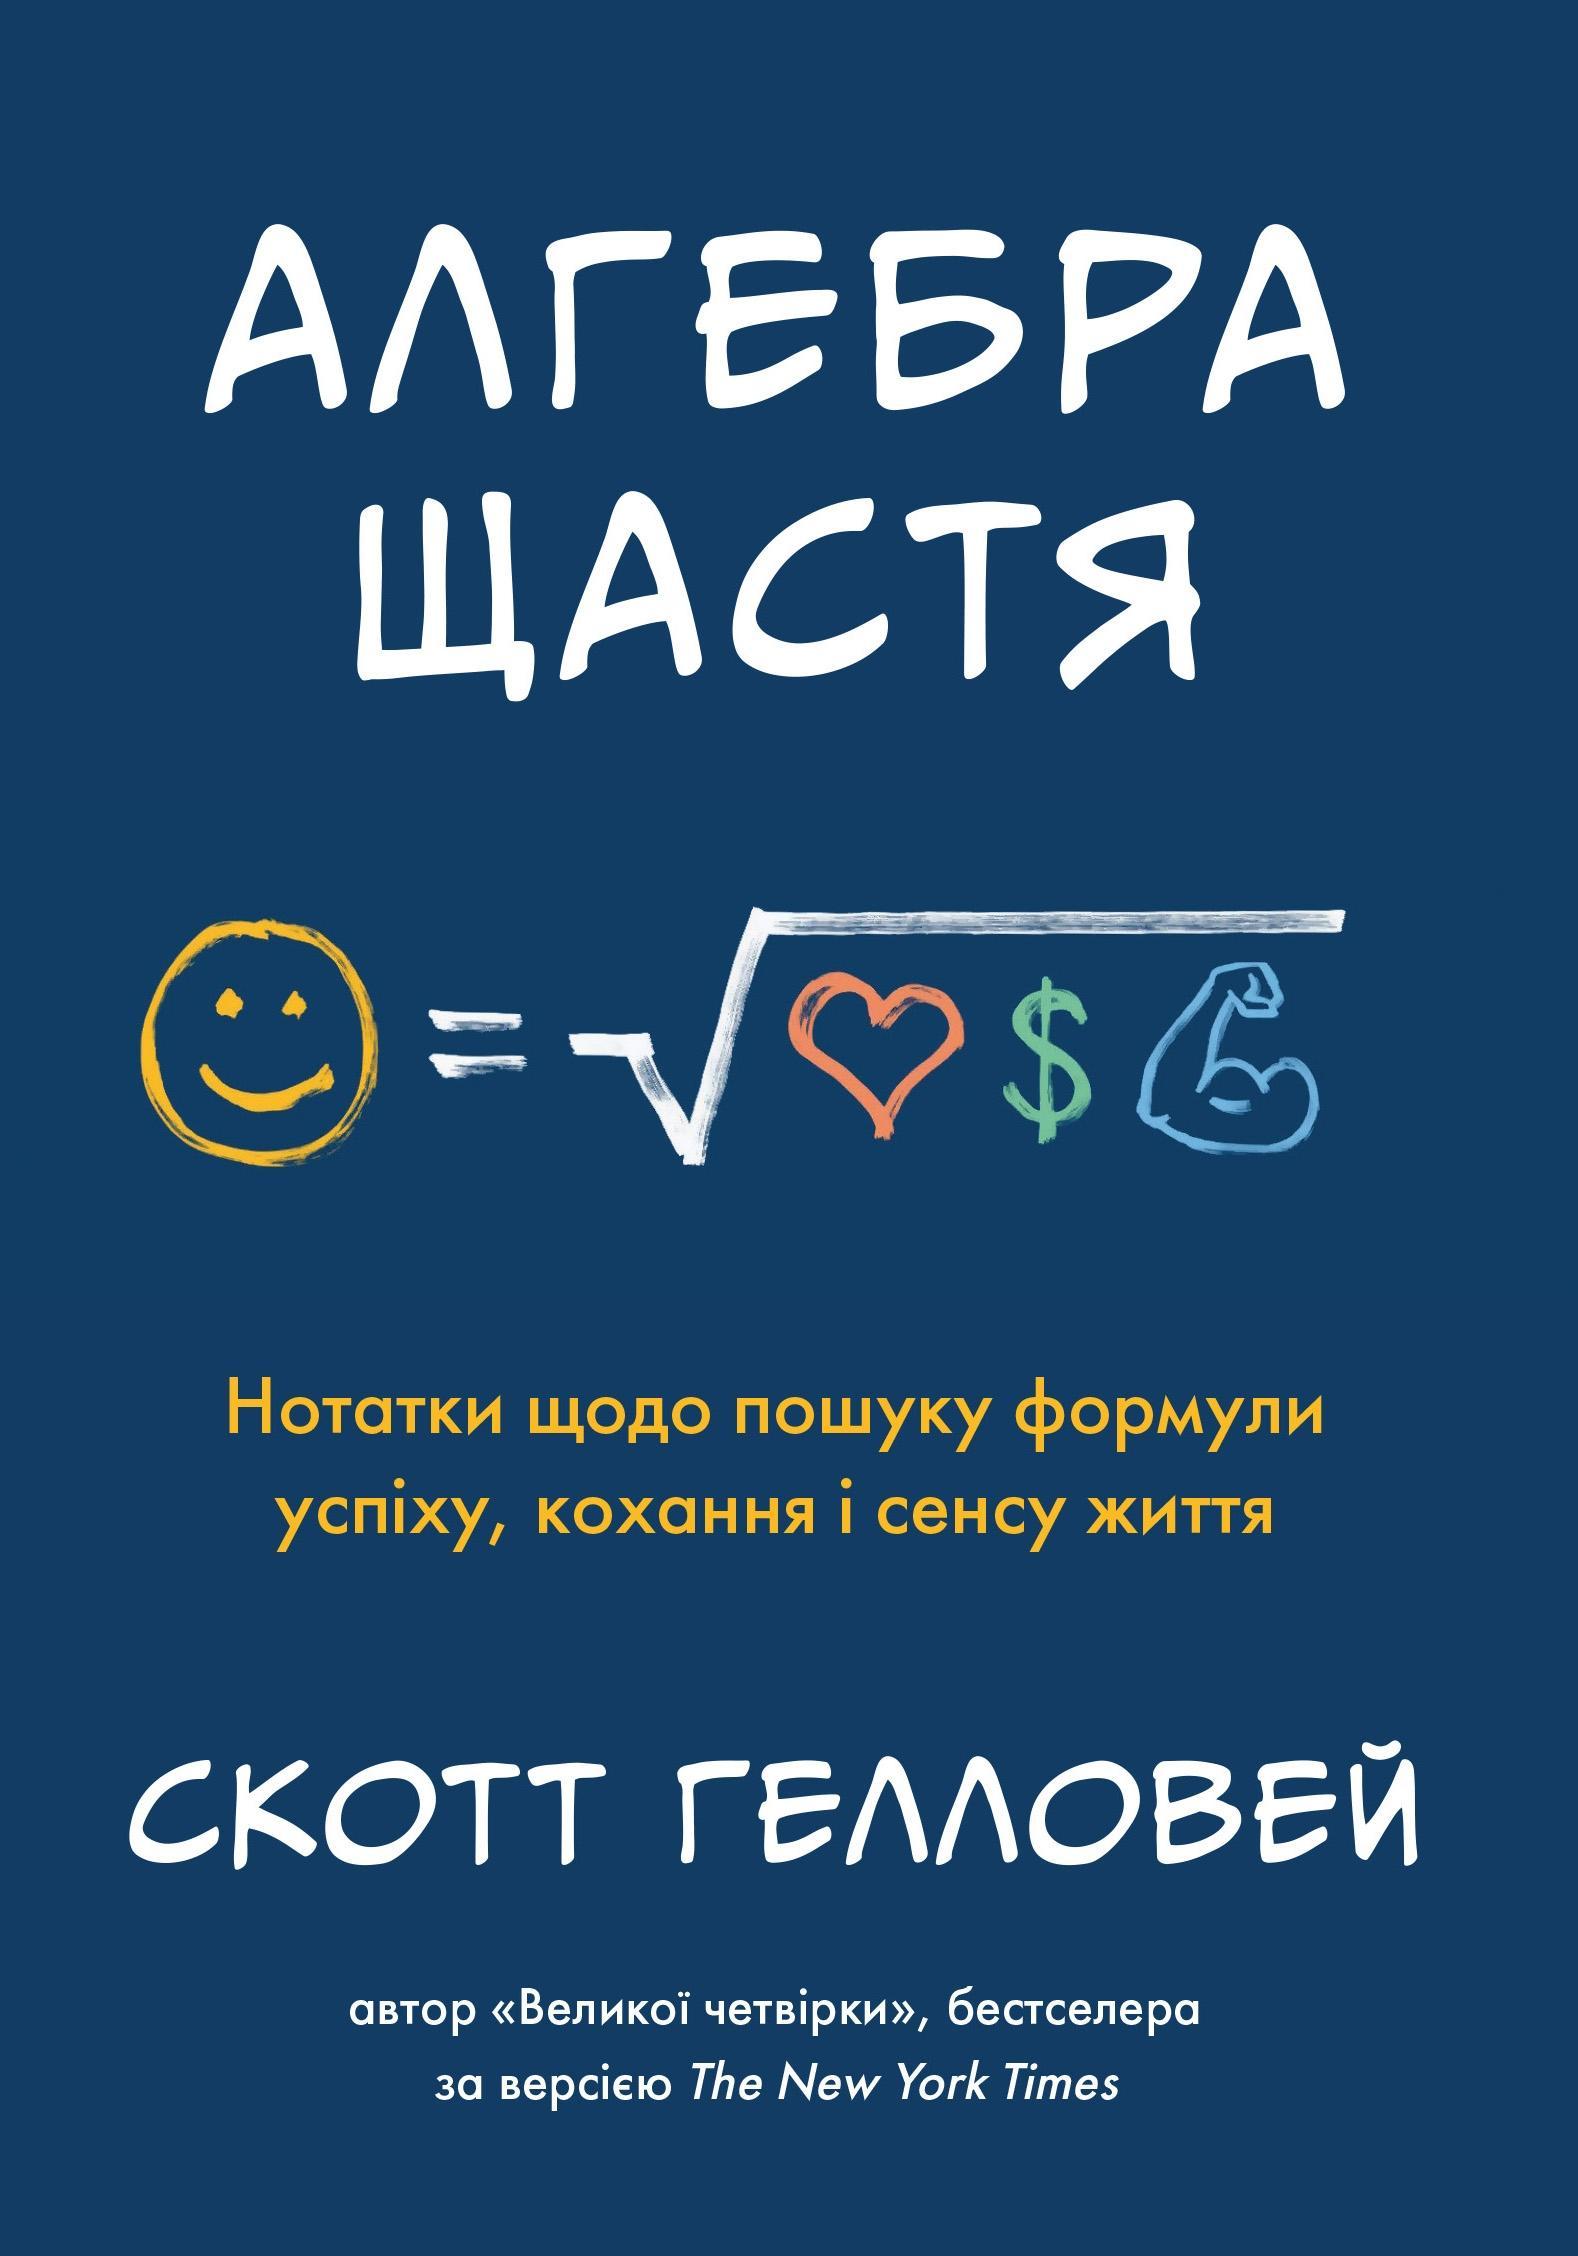 Алгебра щастя